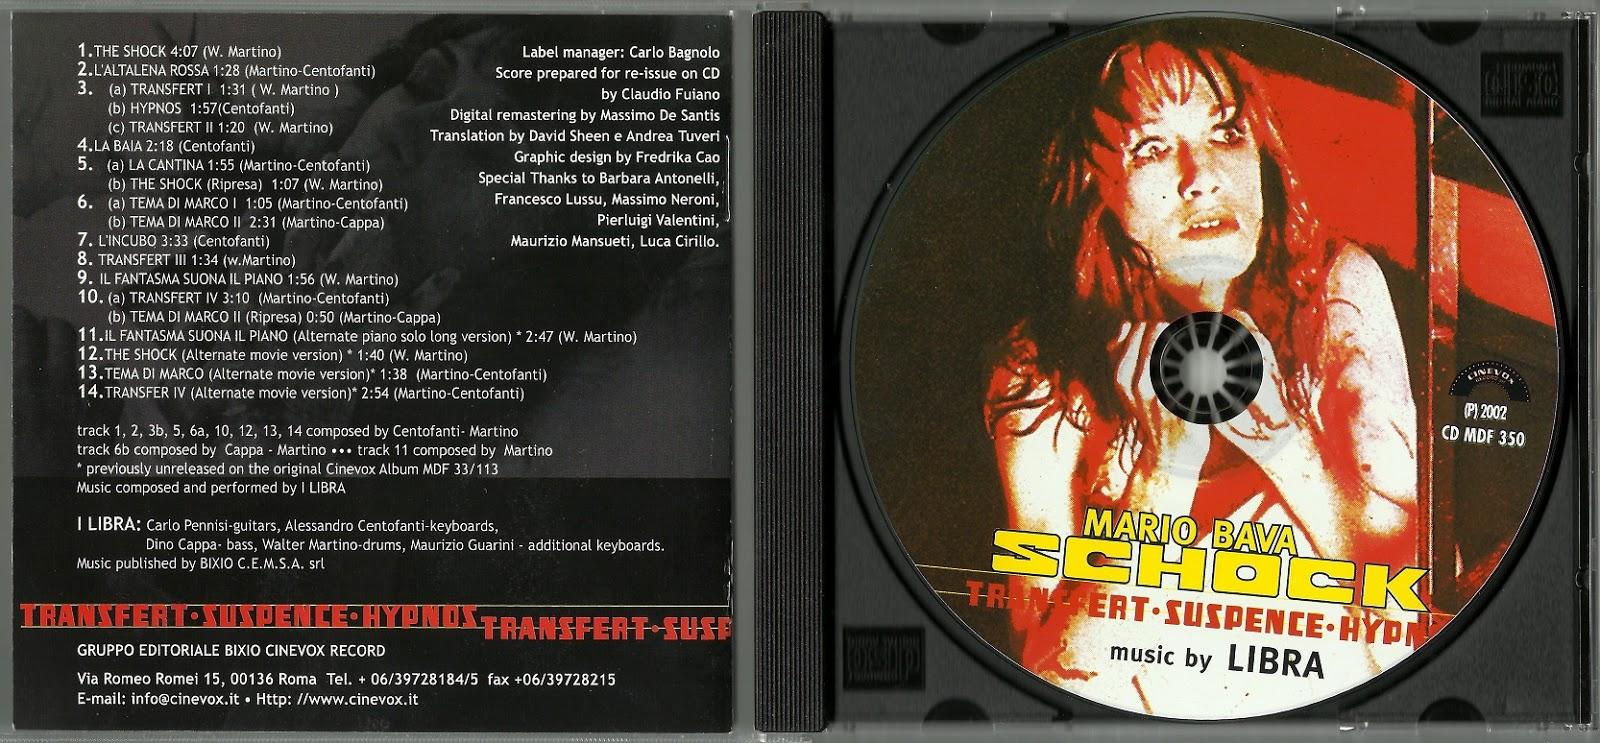 Libra - Schock (Transfert - Suspence - Hypnos) (Original Soundtrack)